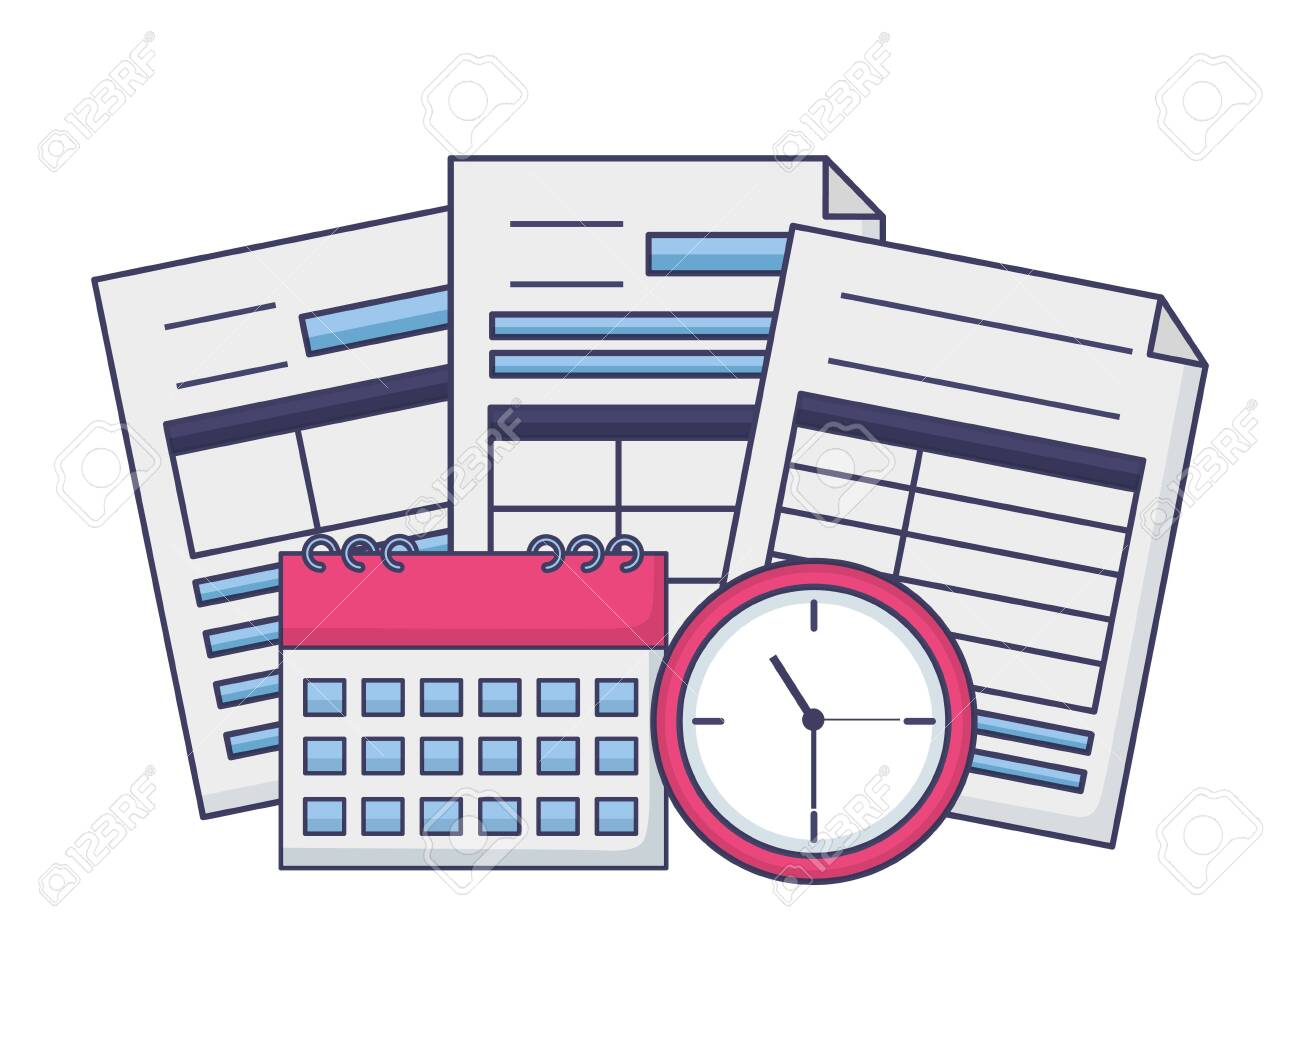 tax payment documents calculator calendar clock vector illustration - 122996255